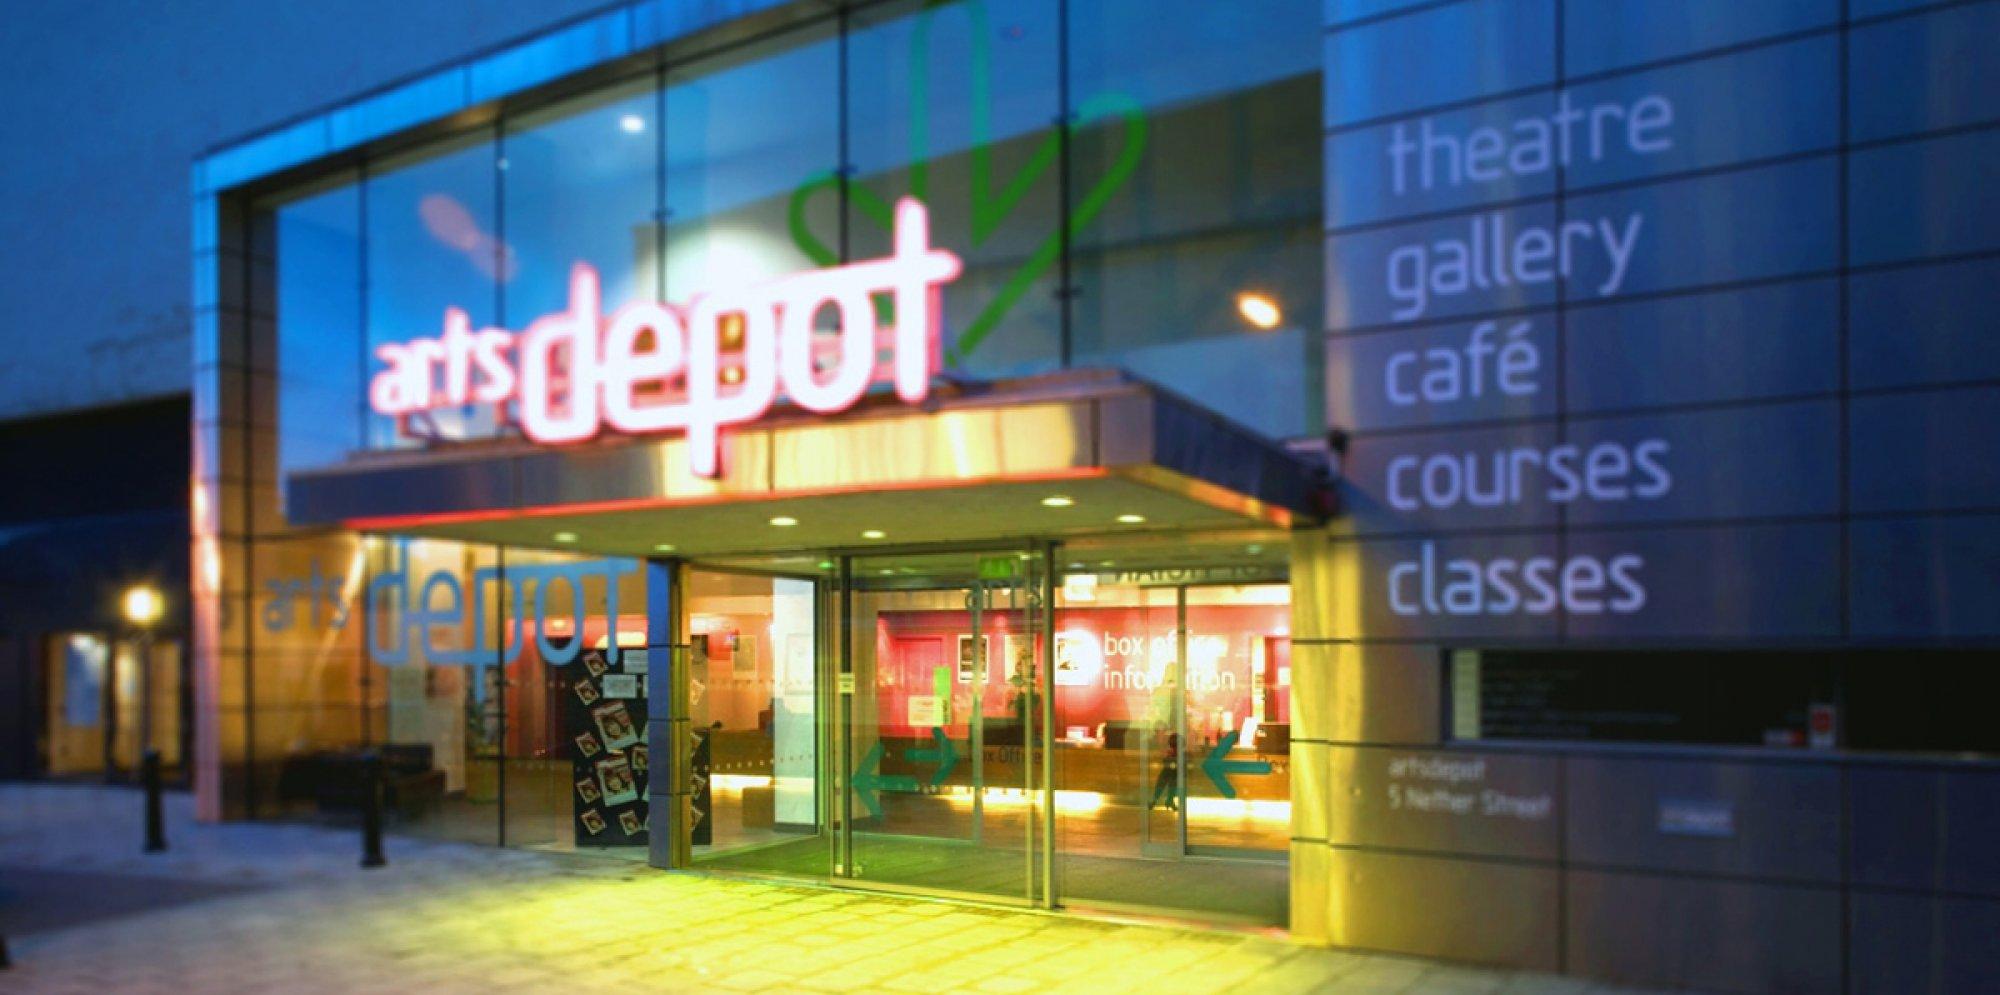 Image of exterior of artsdepot